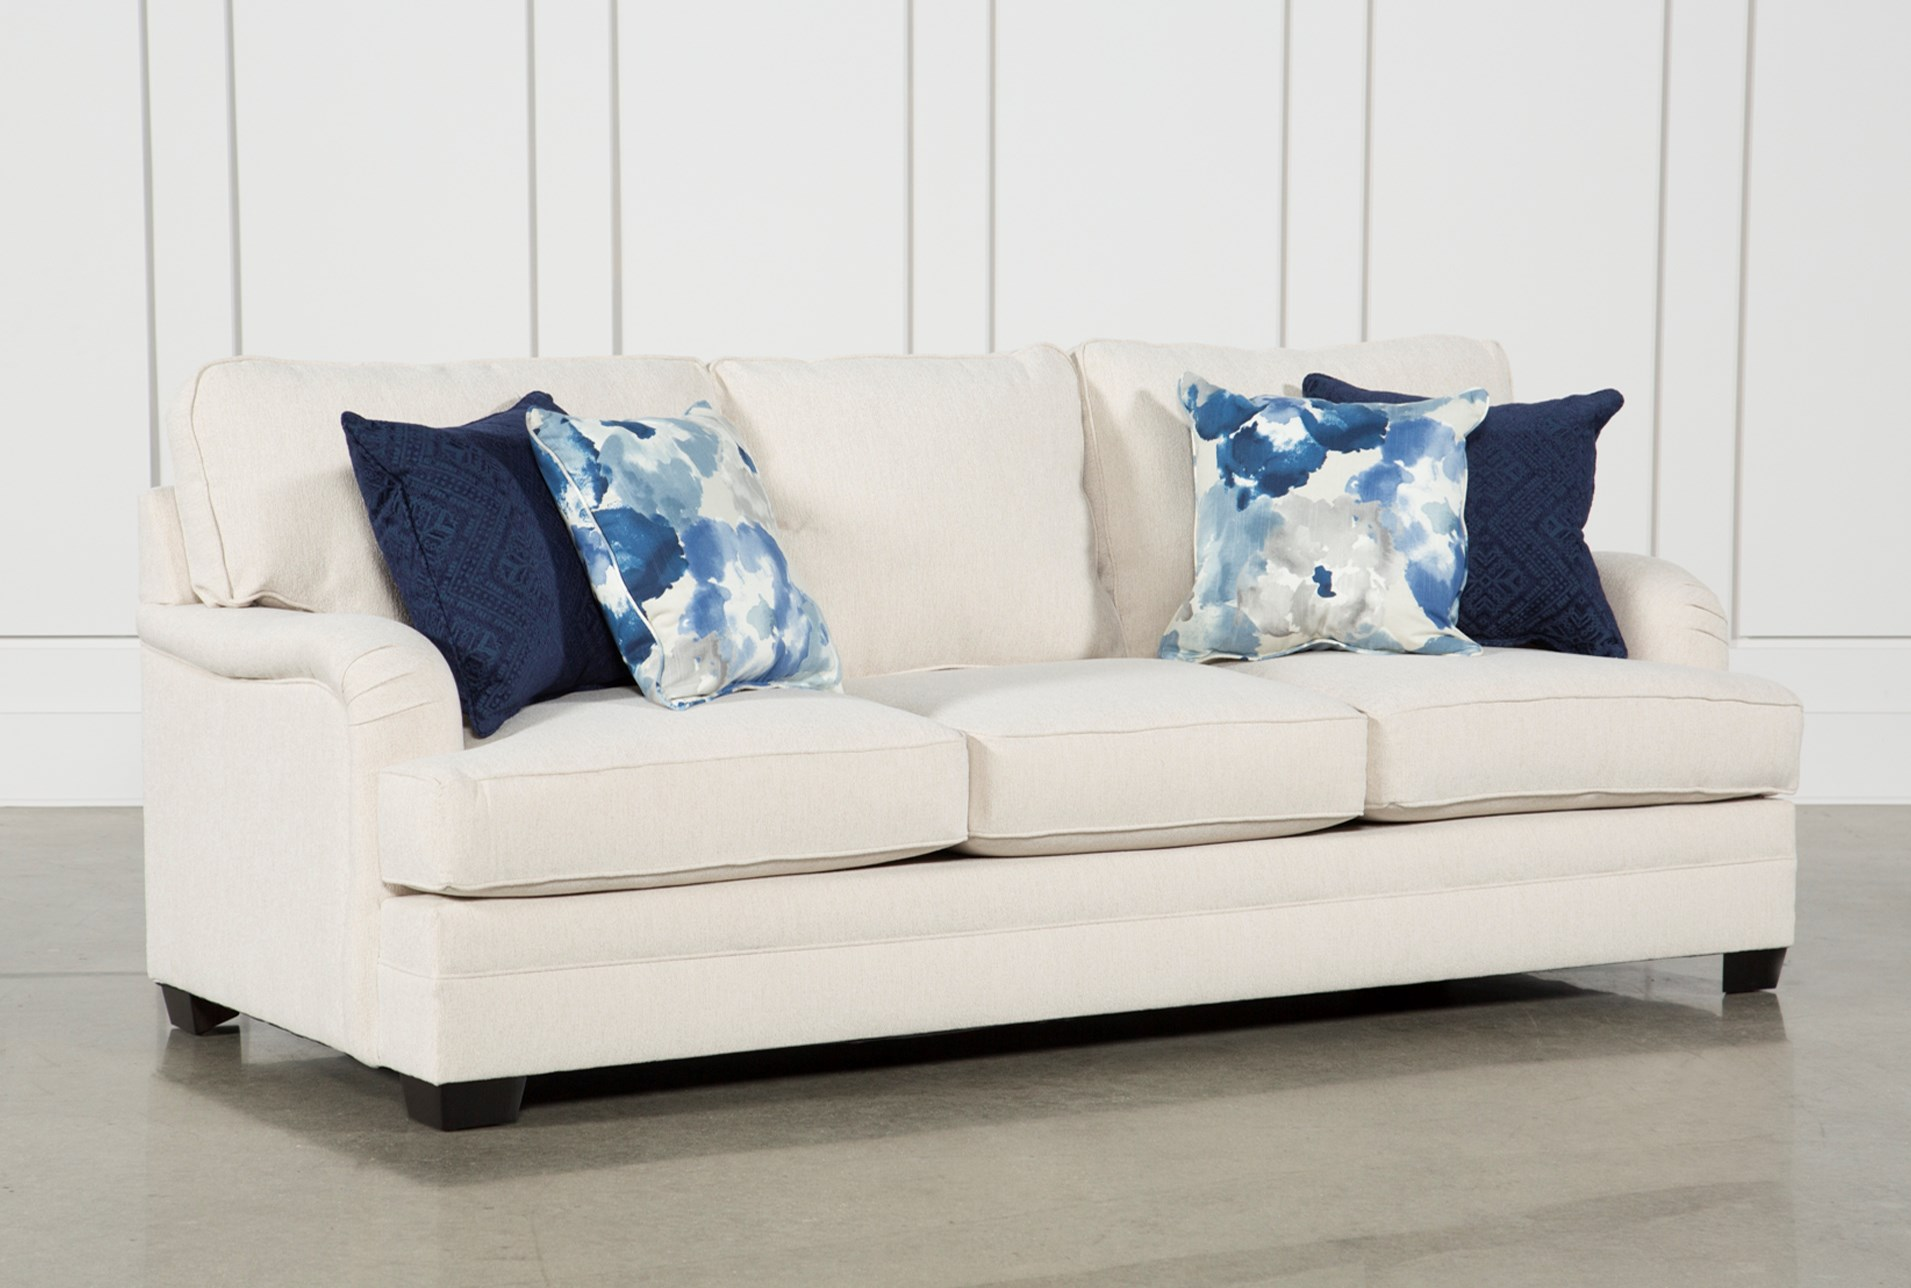 Design Polstersofas Oruga Leicht | upowersc.com